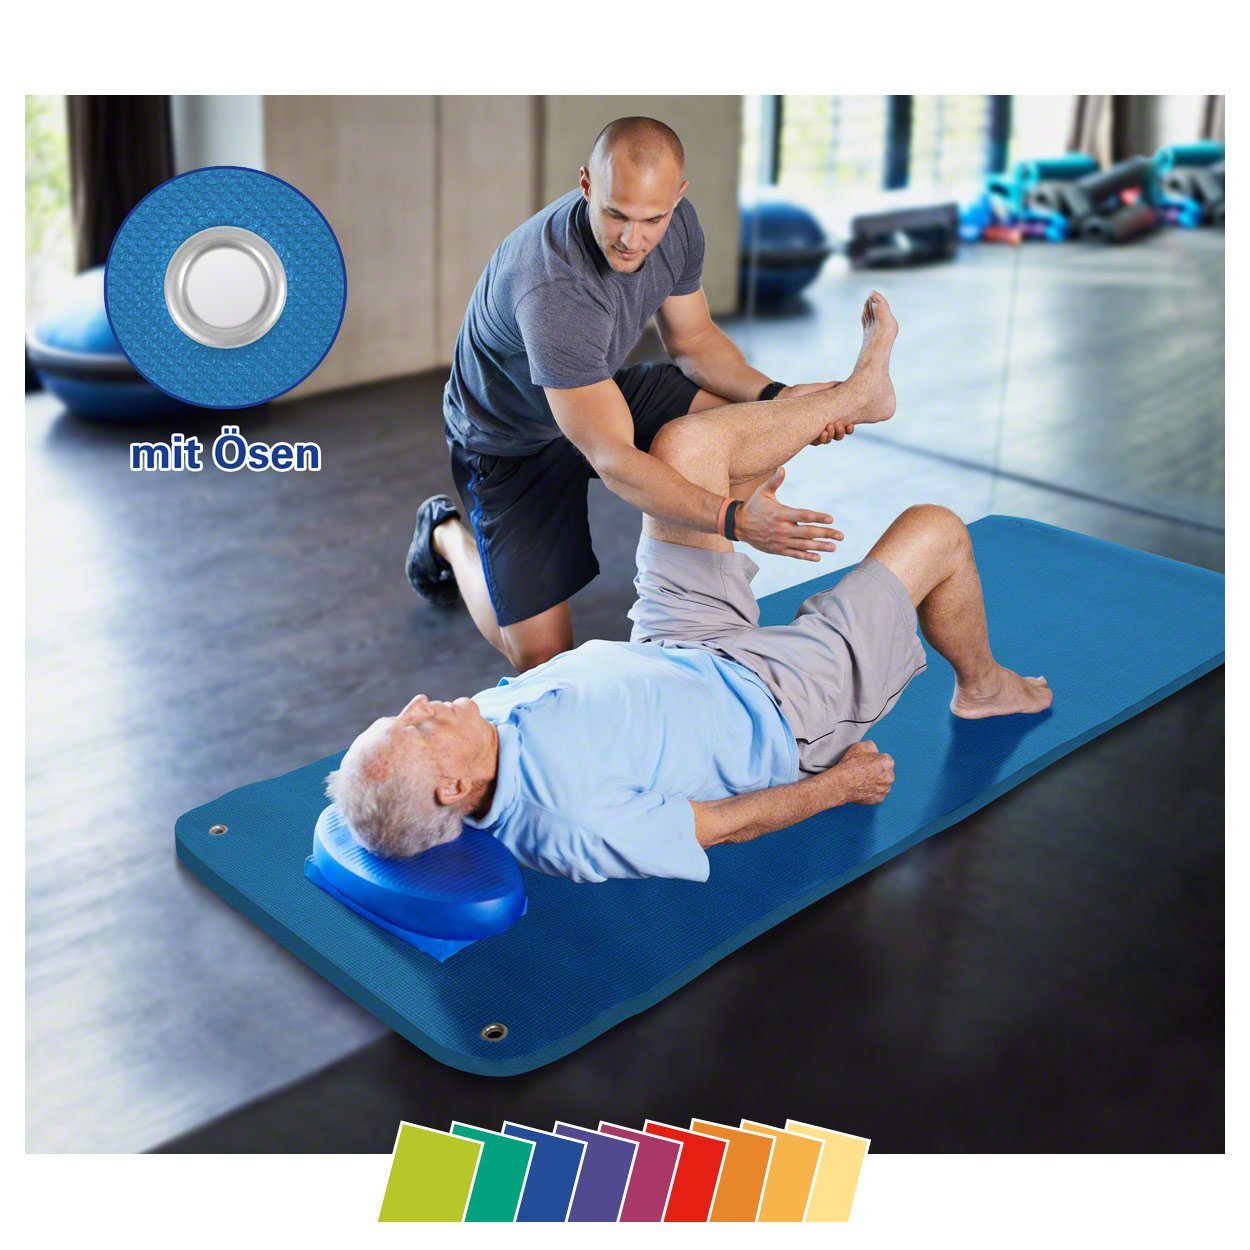 Sport-Tec Therapiematte inkl. Ösen, LxBxH 200x85x1,5 cm